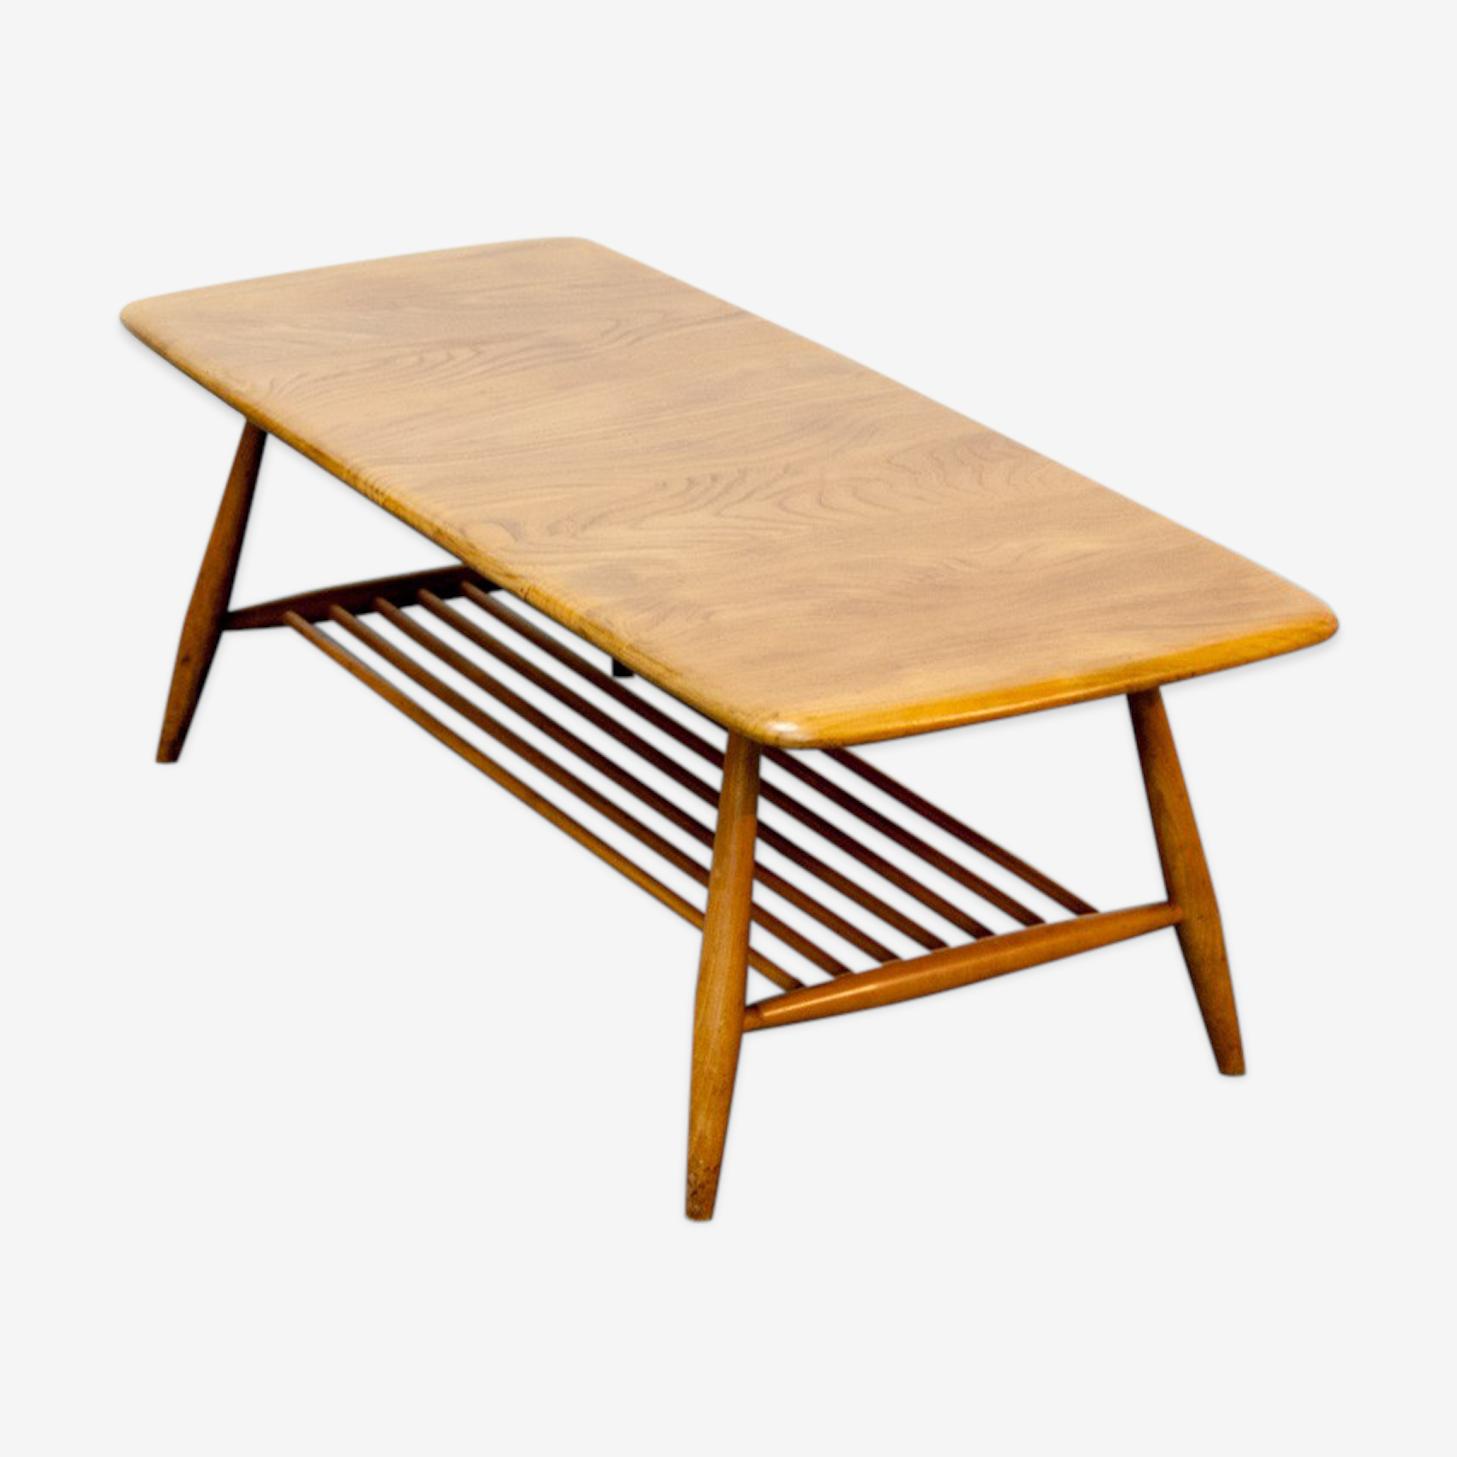 Table basse Ercol